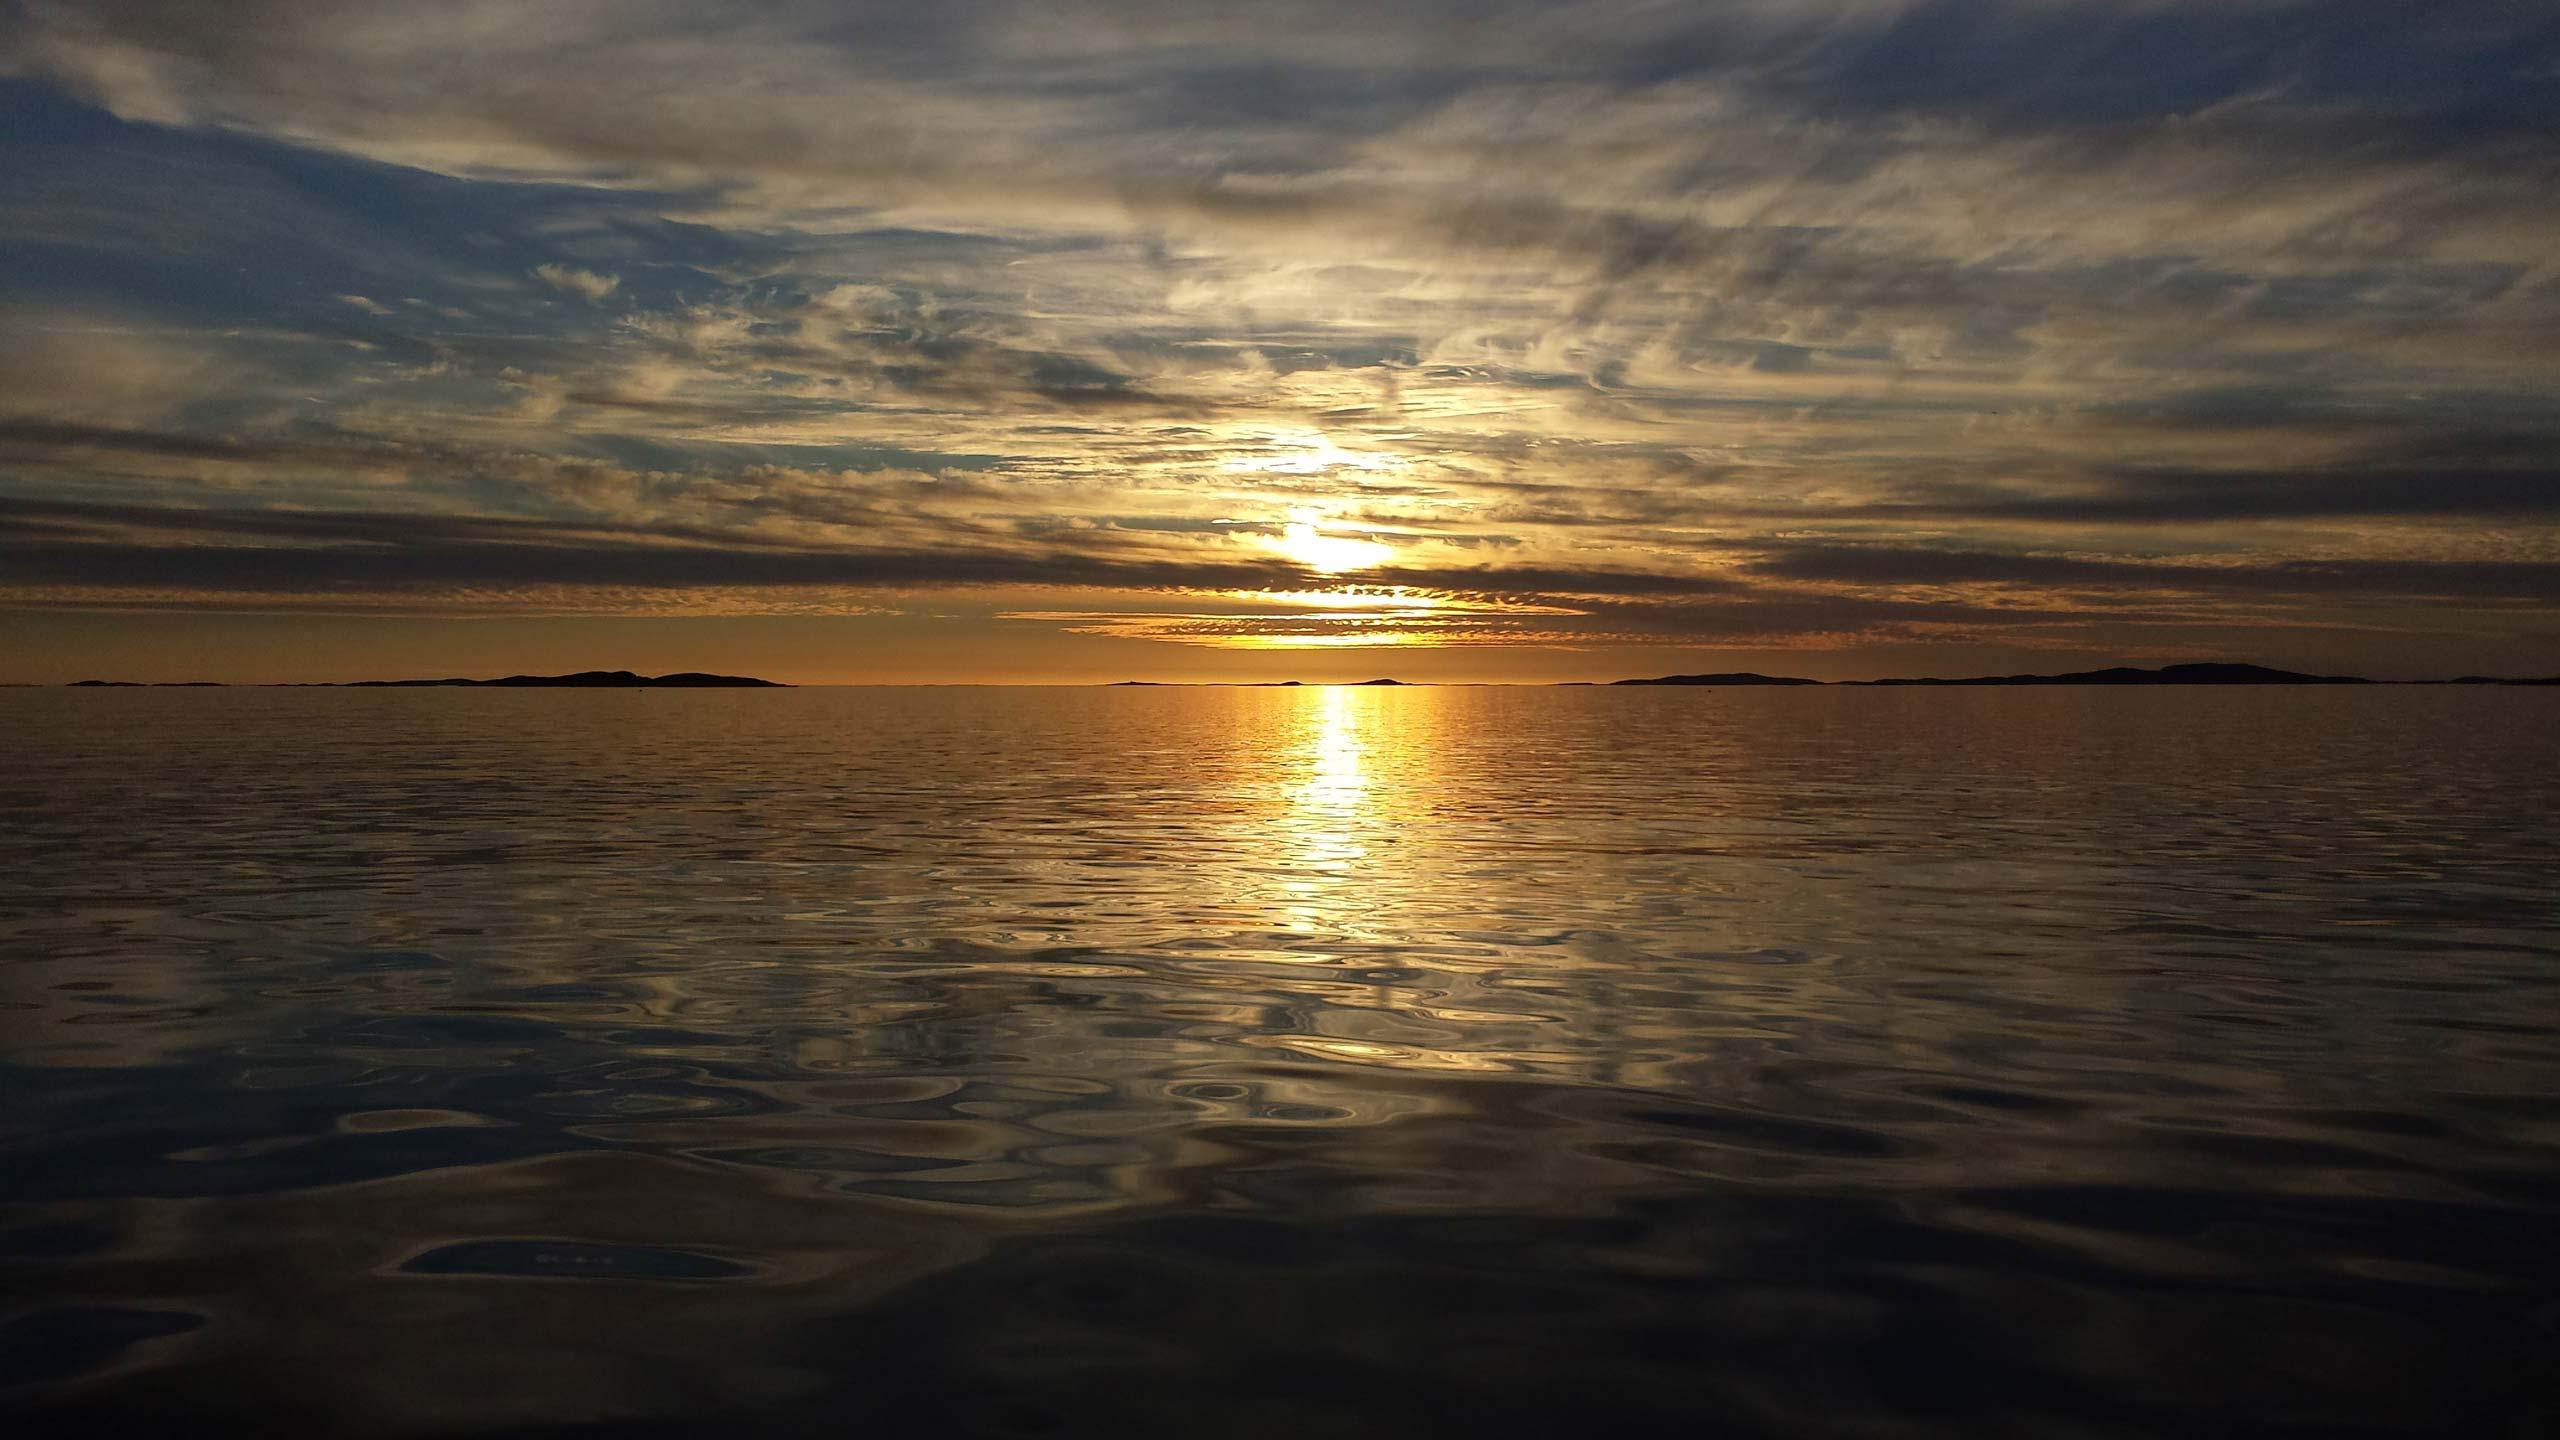 Navy Rørvik & Navy Sandnessjøen